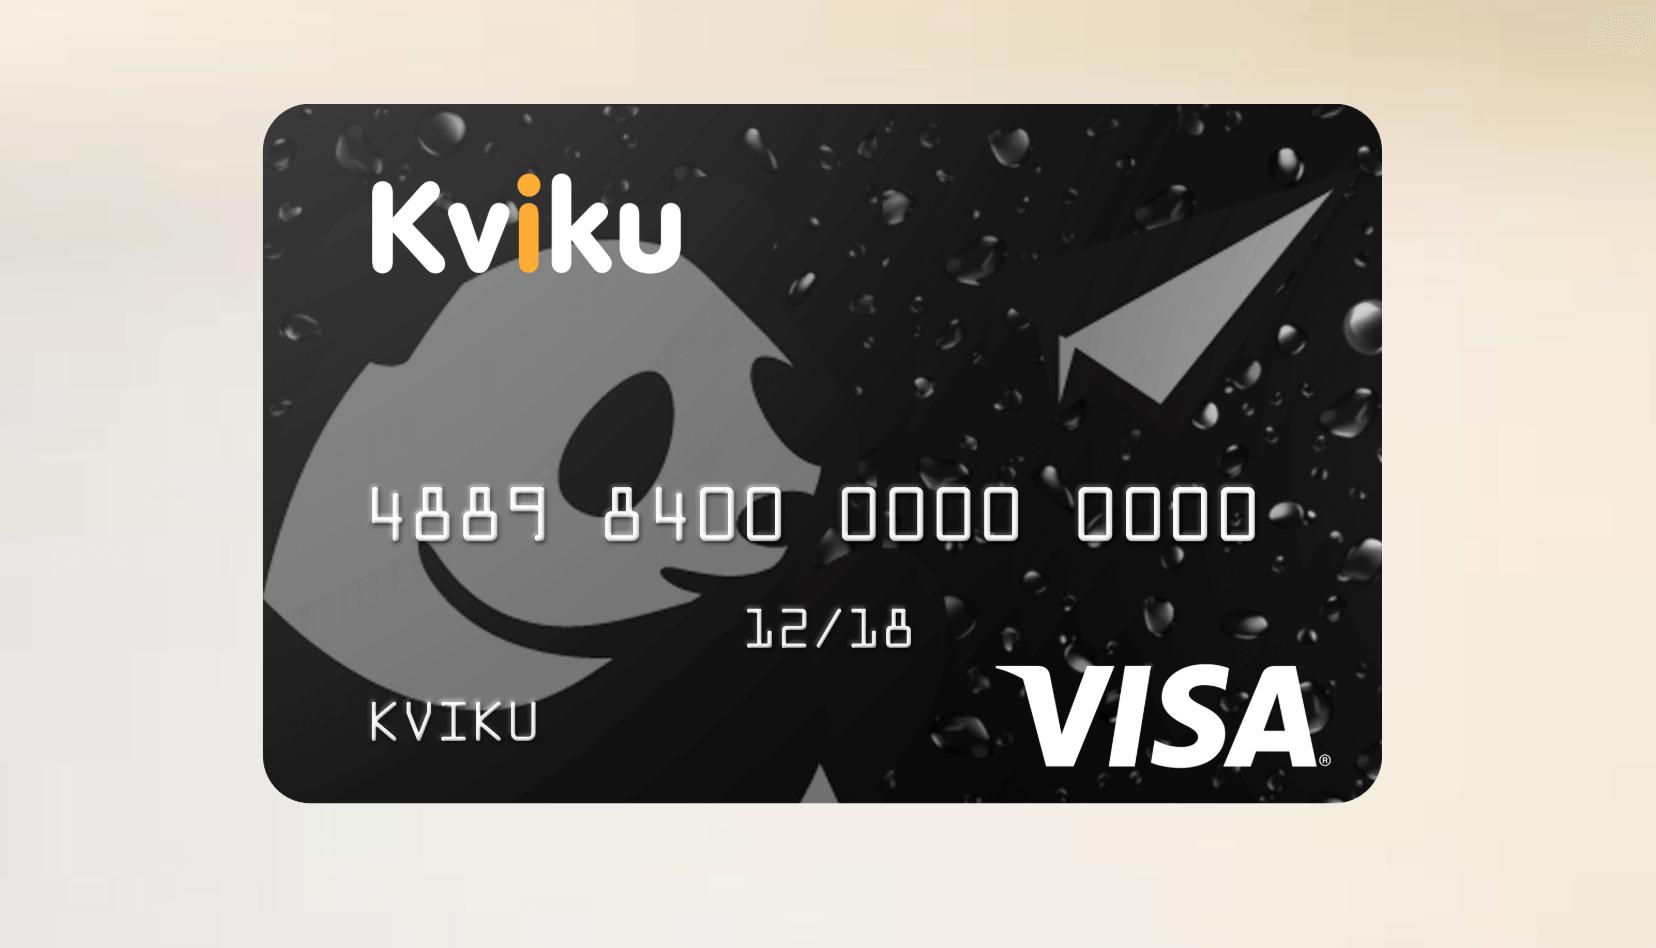 онлайн заявка на кредитную карту во все банки россии